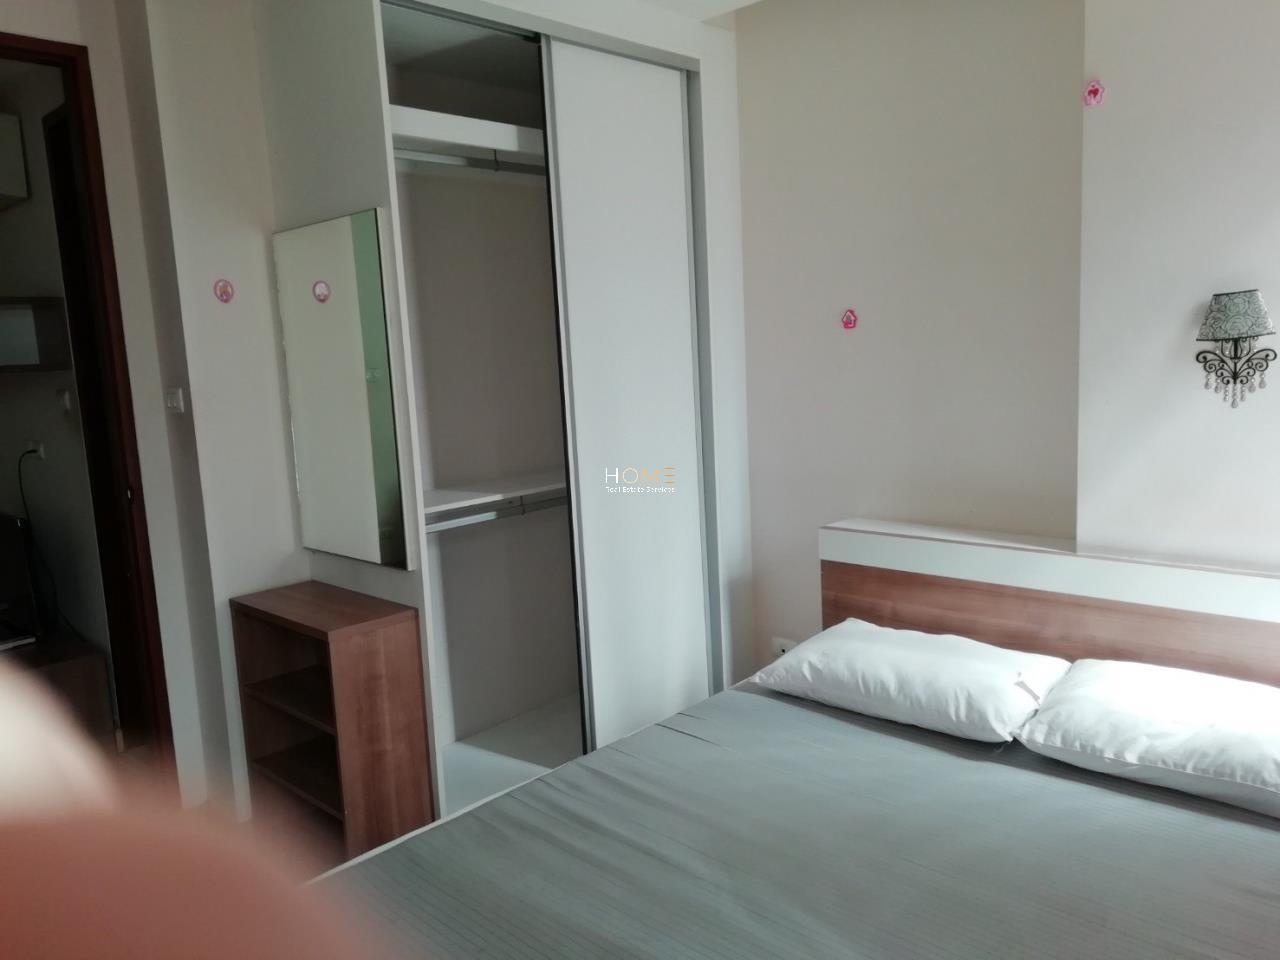 HOME - Real Estate Services Agency's Emerald Residence Ratchada / 1 Bed (FOR SALE & RENT), เอมเมอรัลด์ เรสซิเดนท์ รัชดา / 1 ห้องนอน (ขายและให้เช่า) Nub045 6